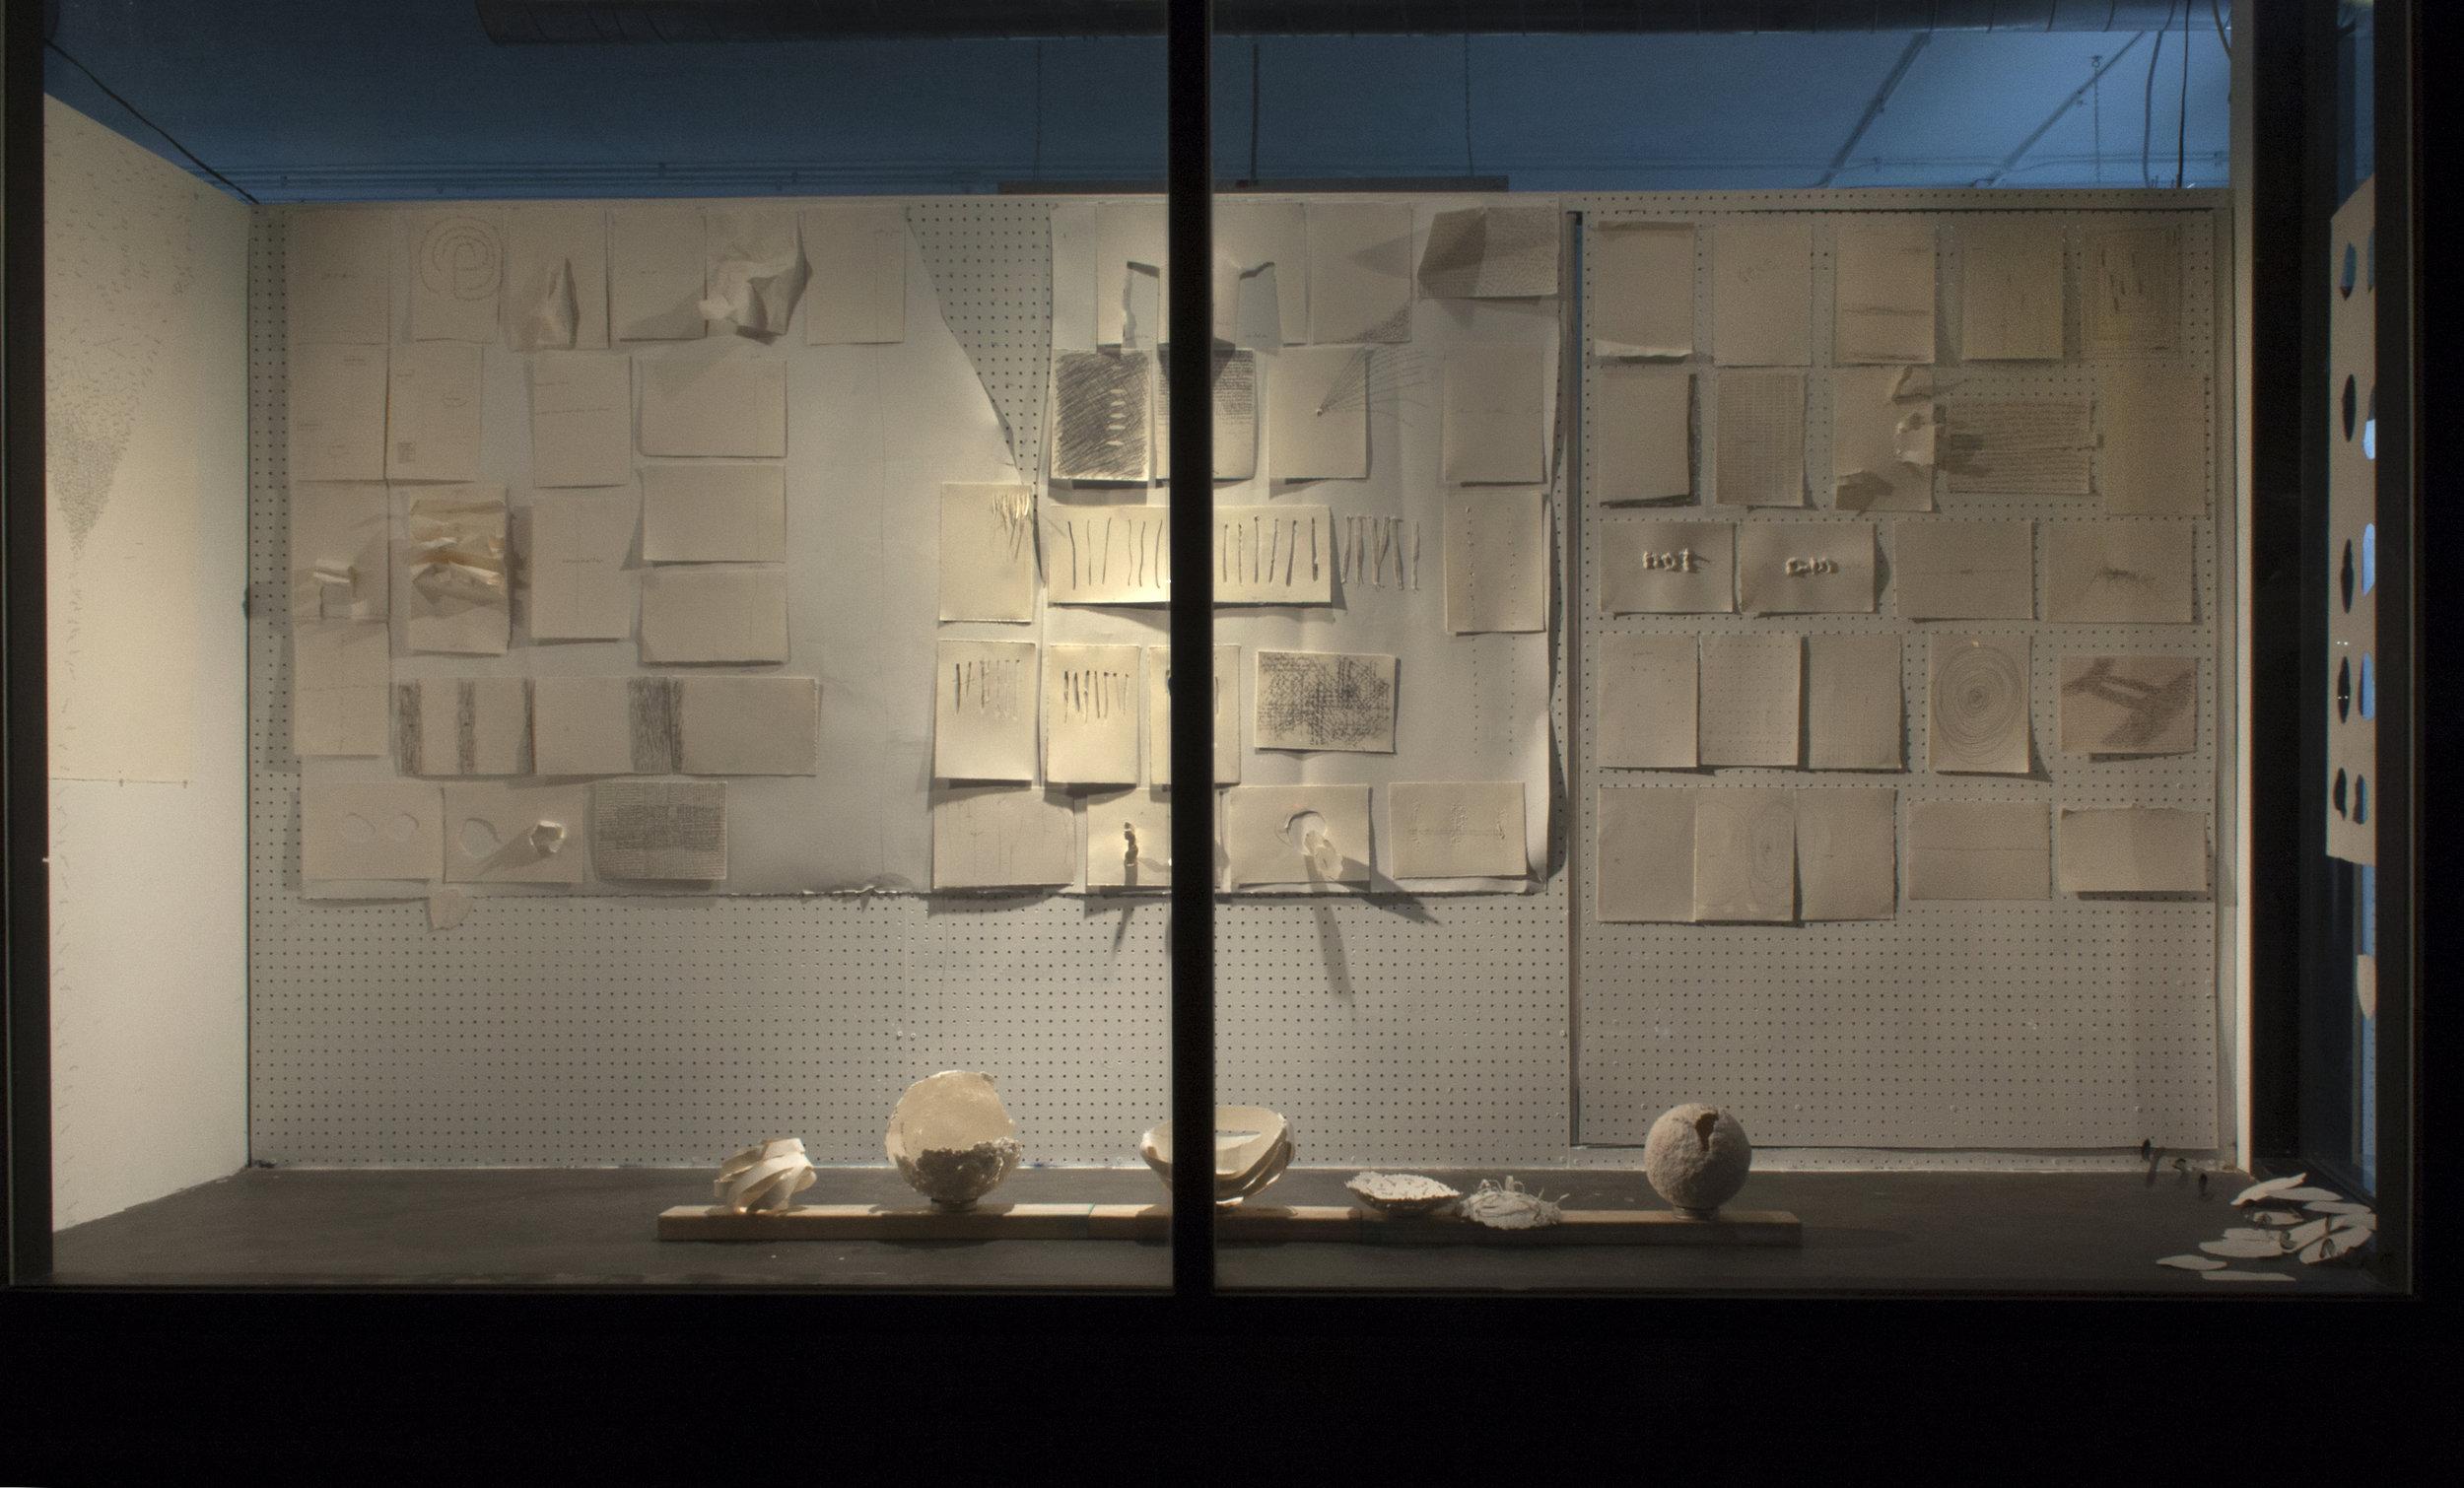 Friendzone Gallery installation, May 2017